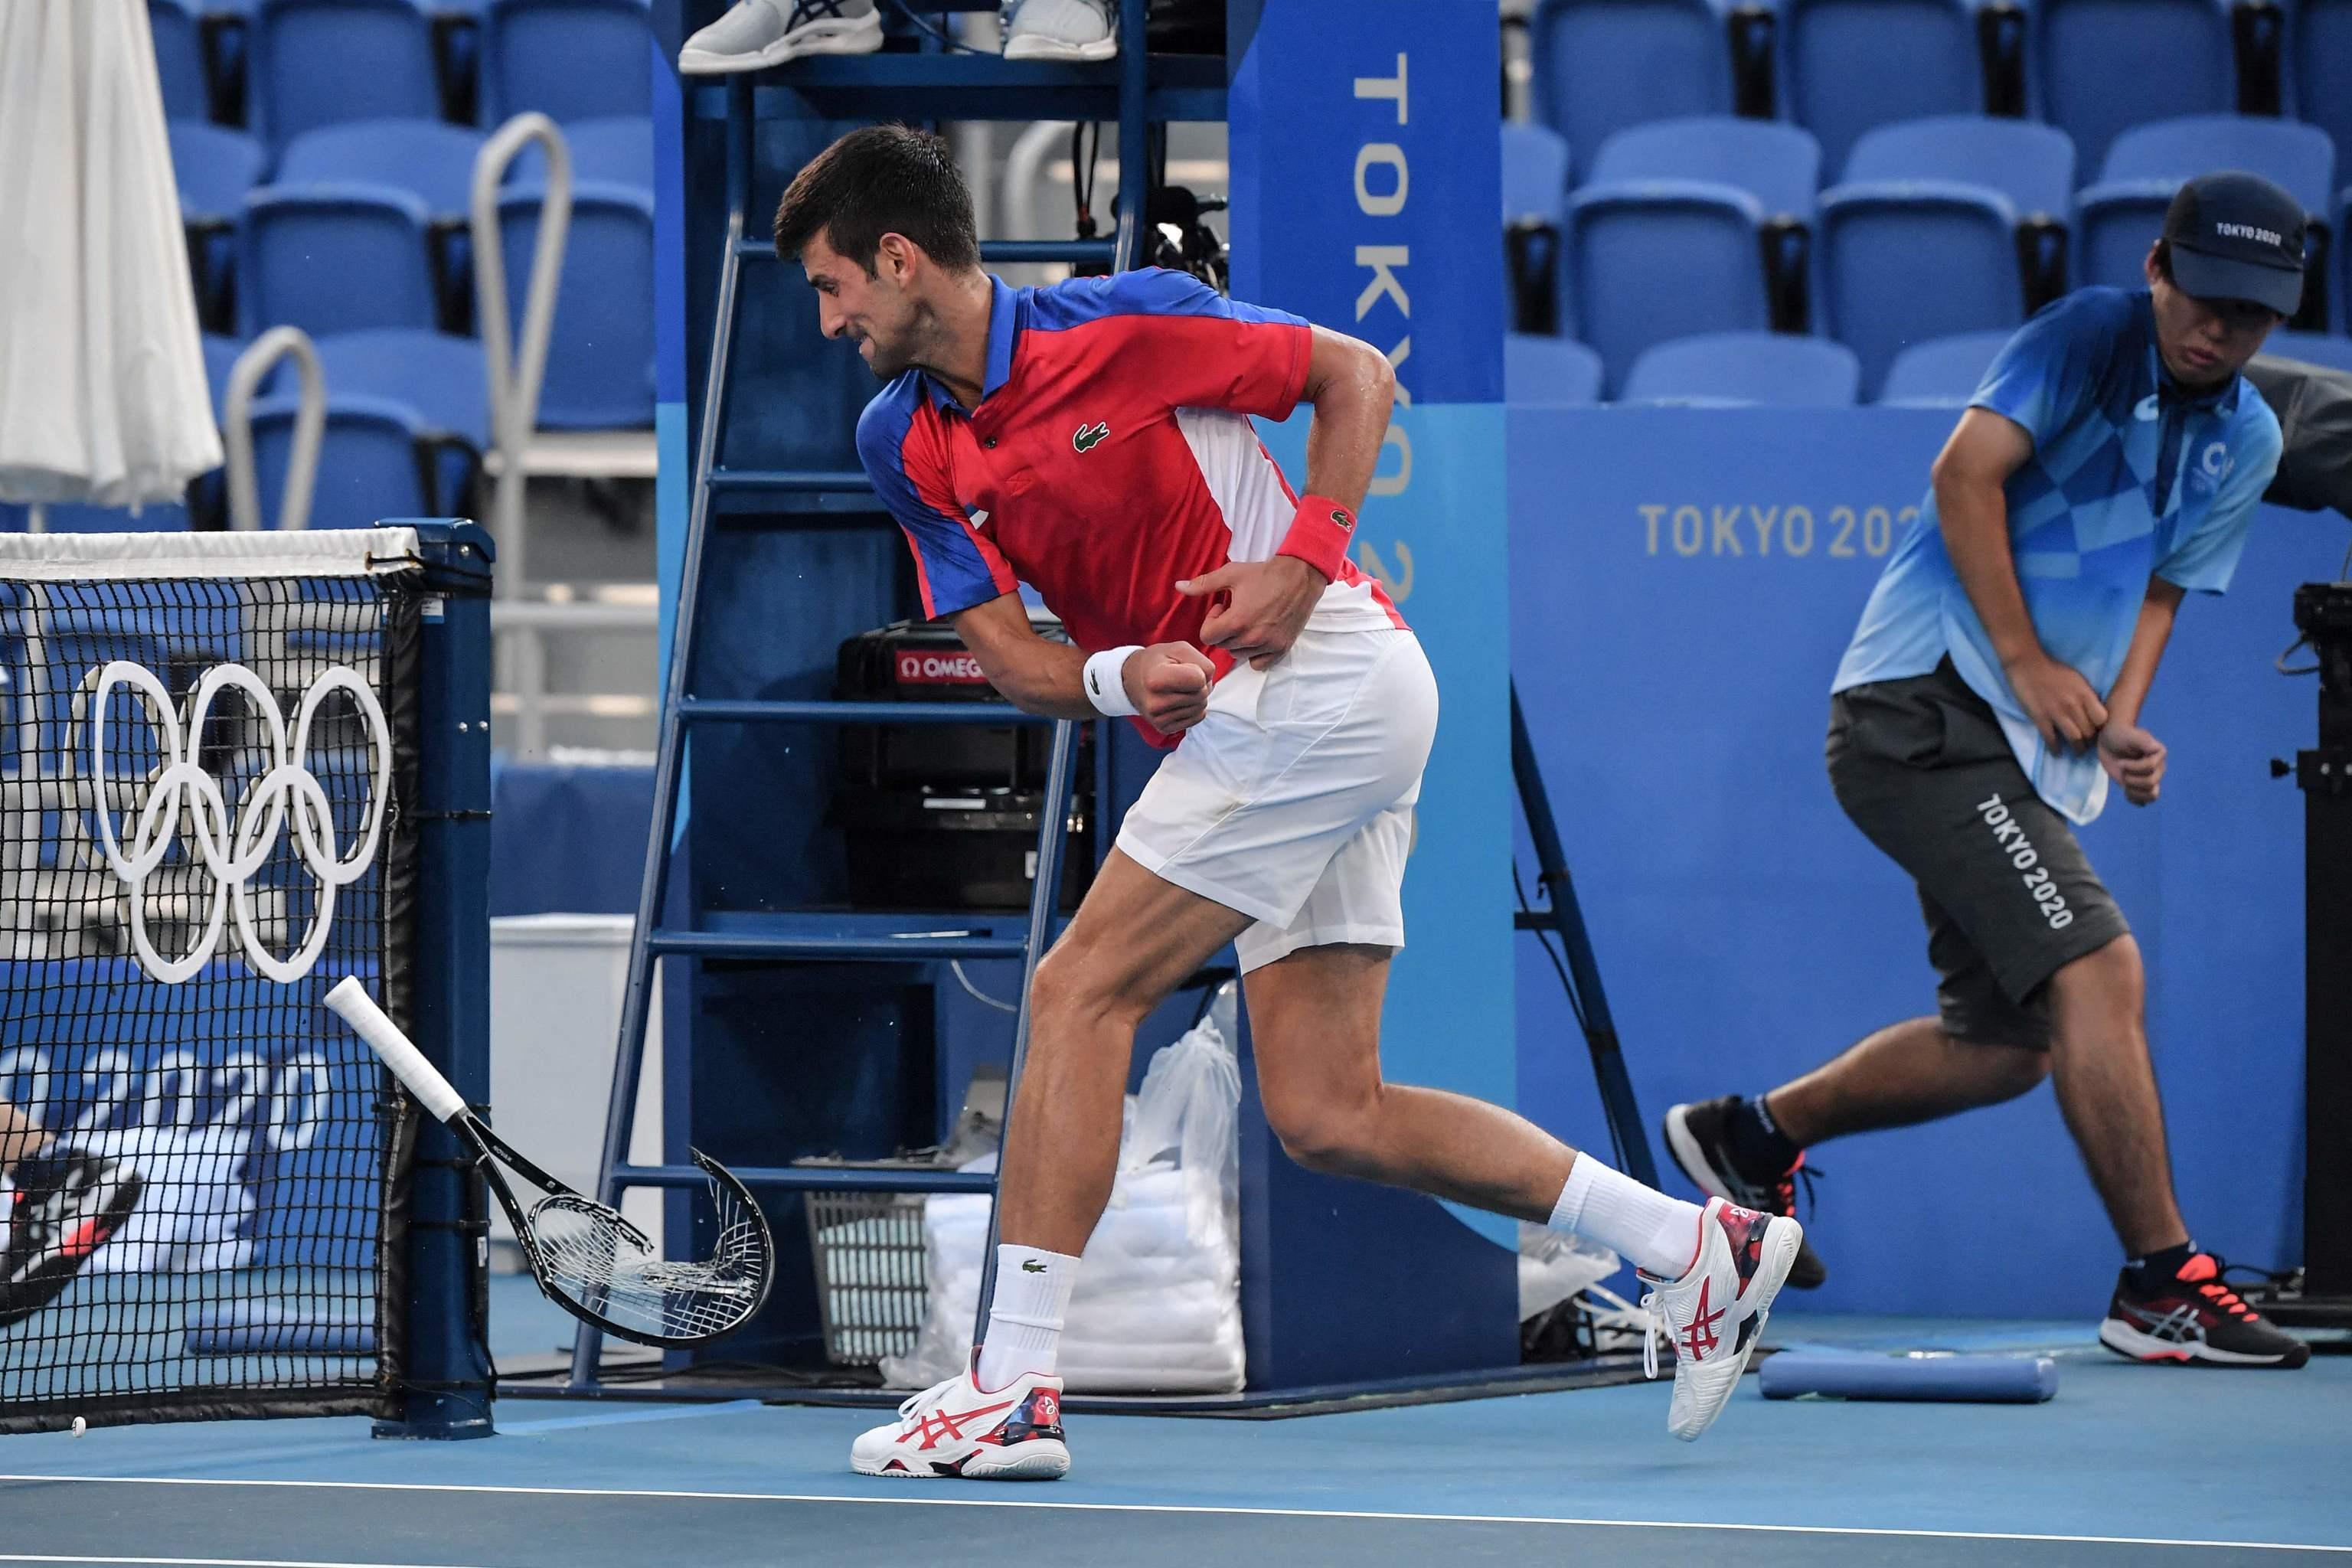 Djokovic rompe su raqueta durante el tercer set.